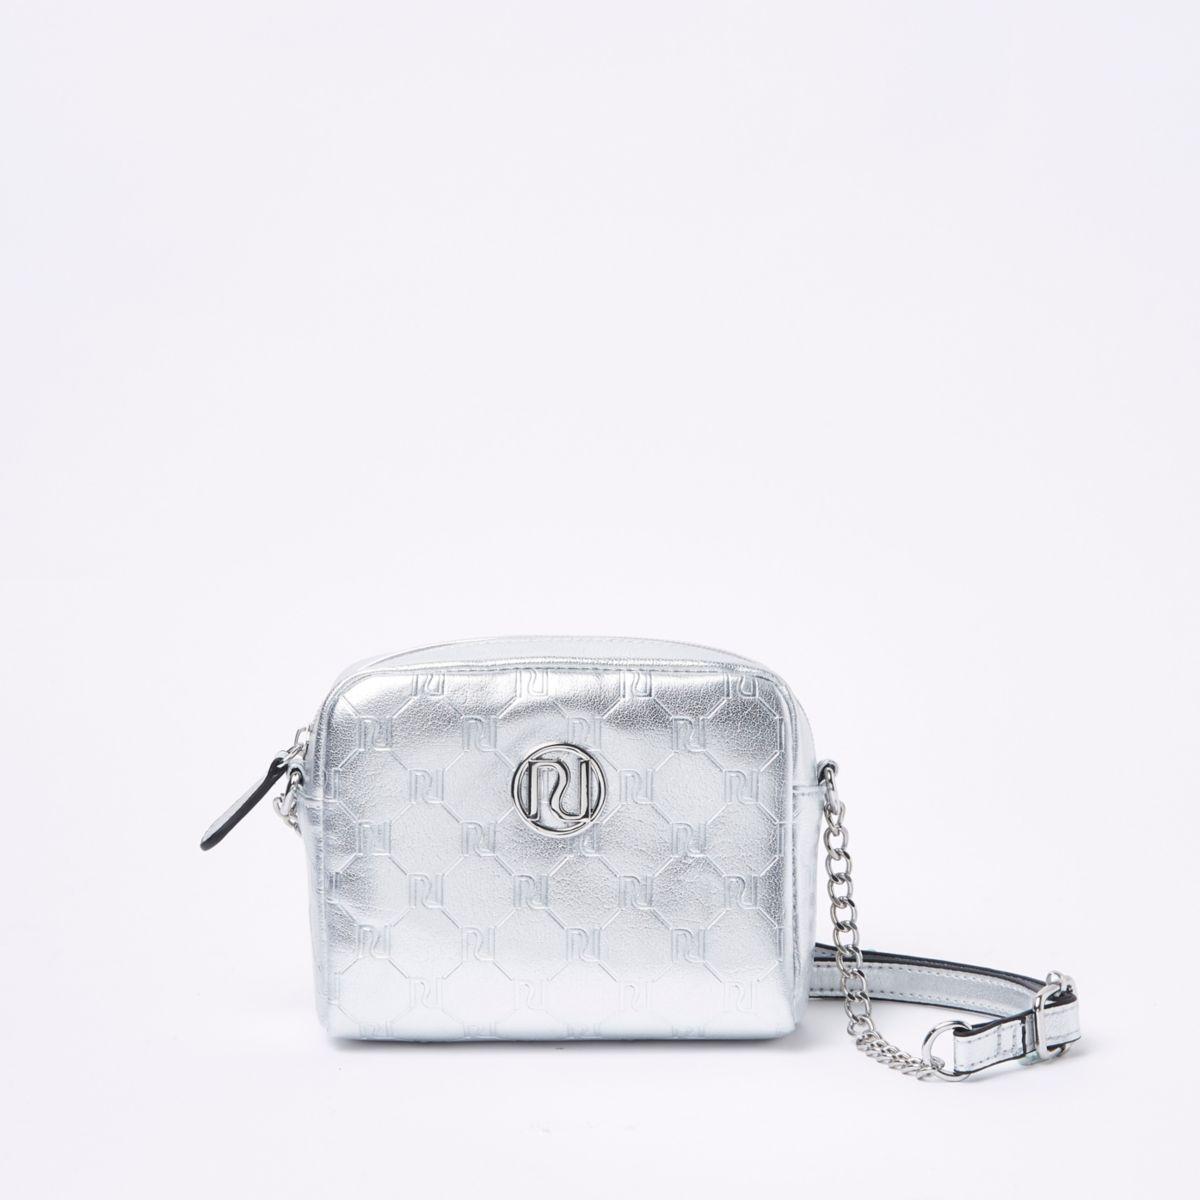 Girls silver tone RI cross body bag